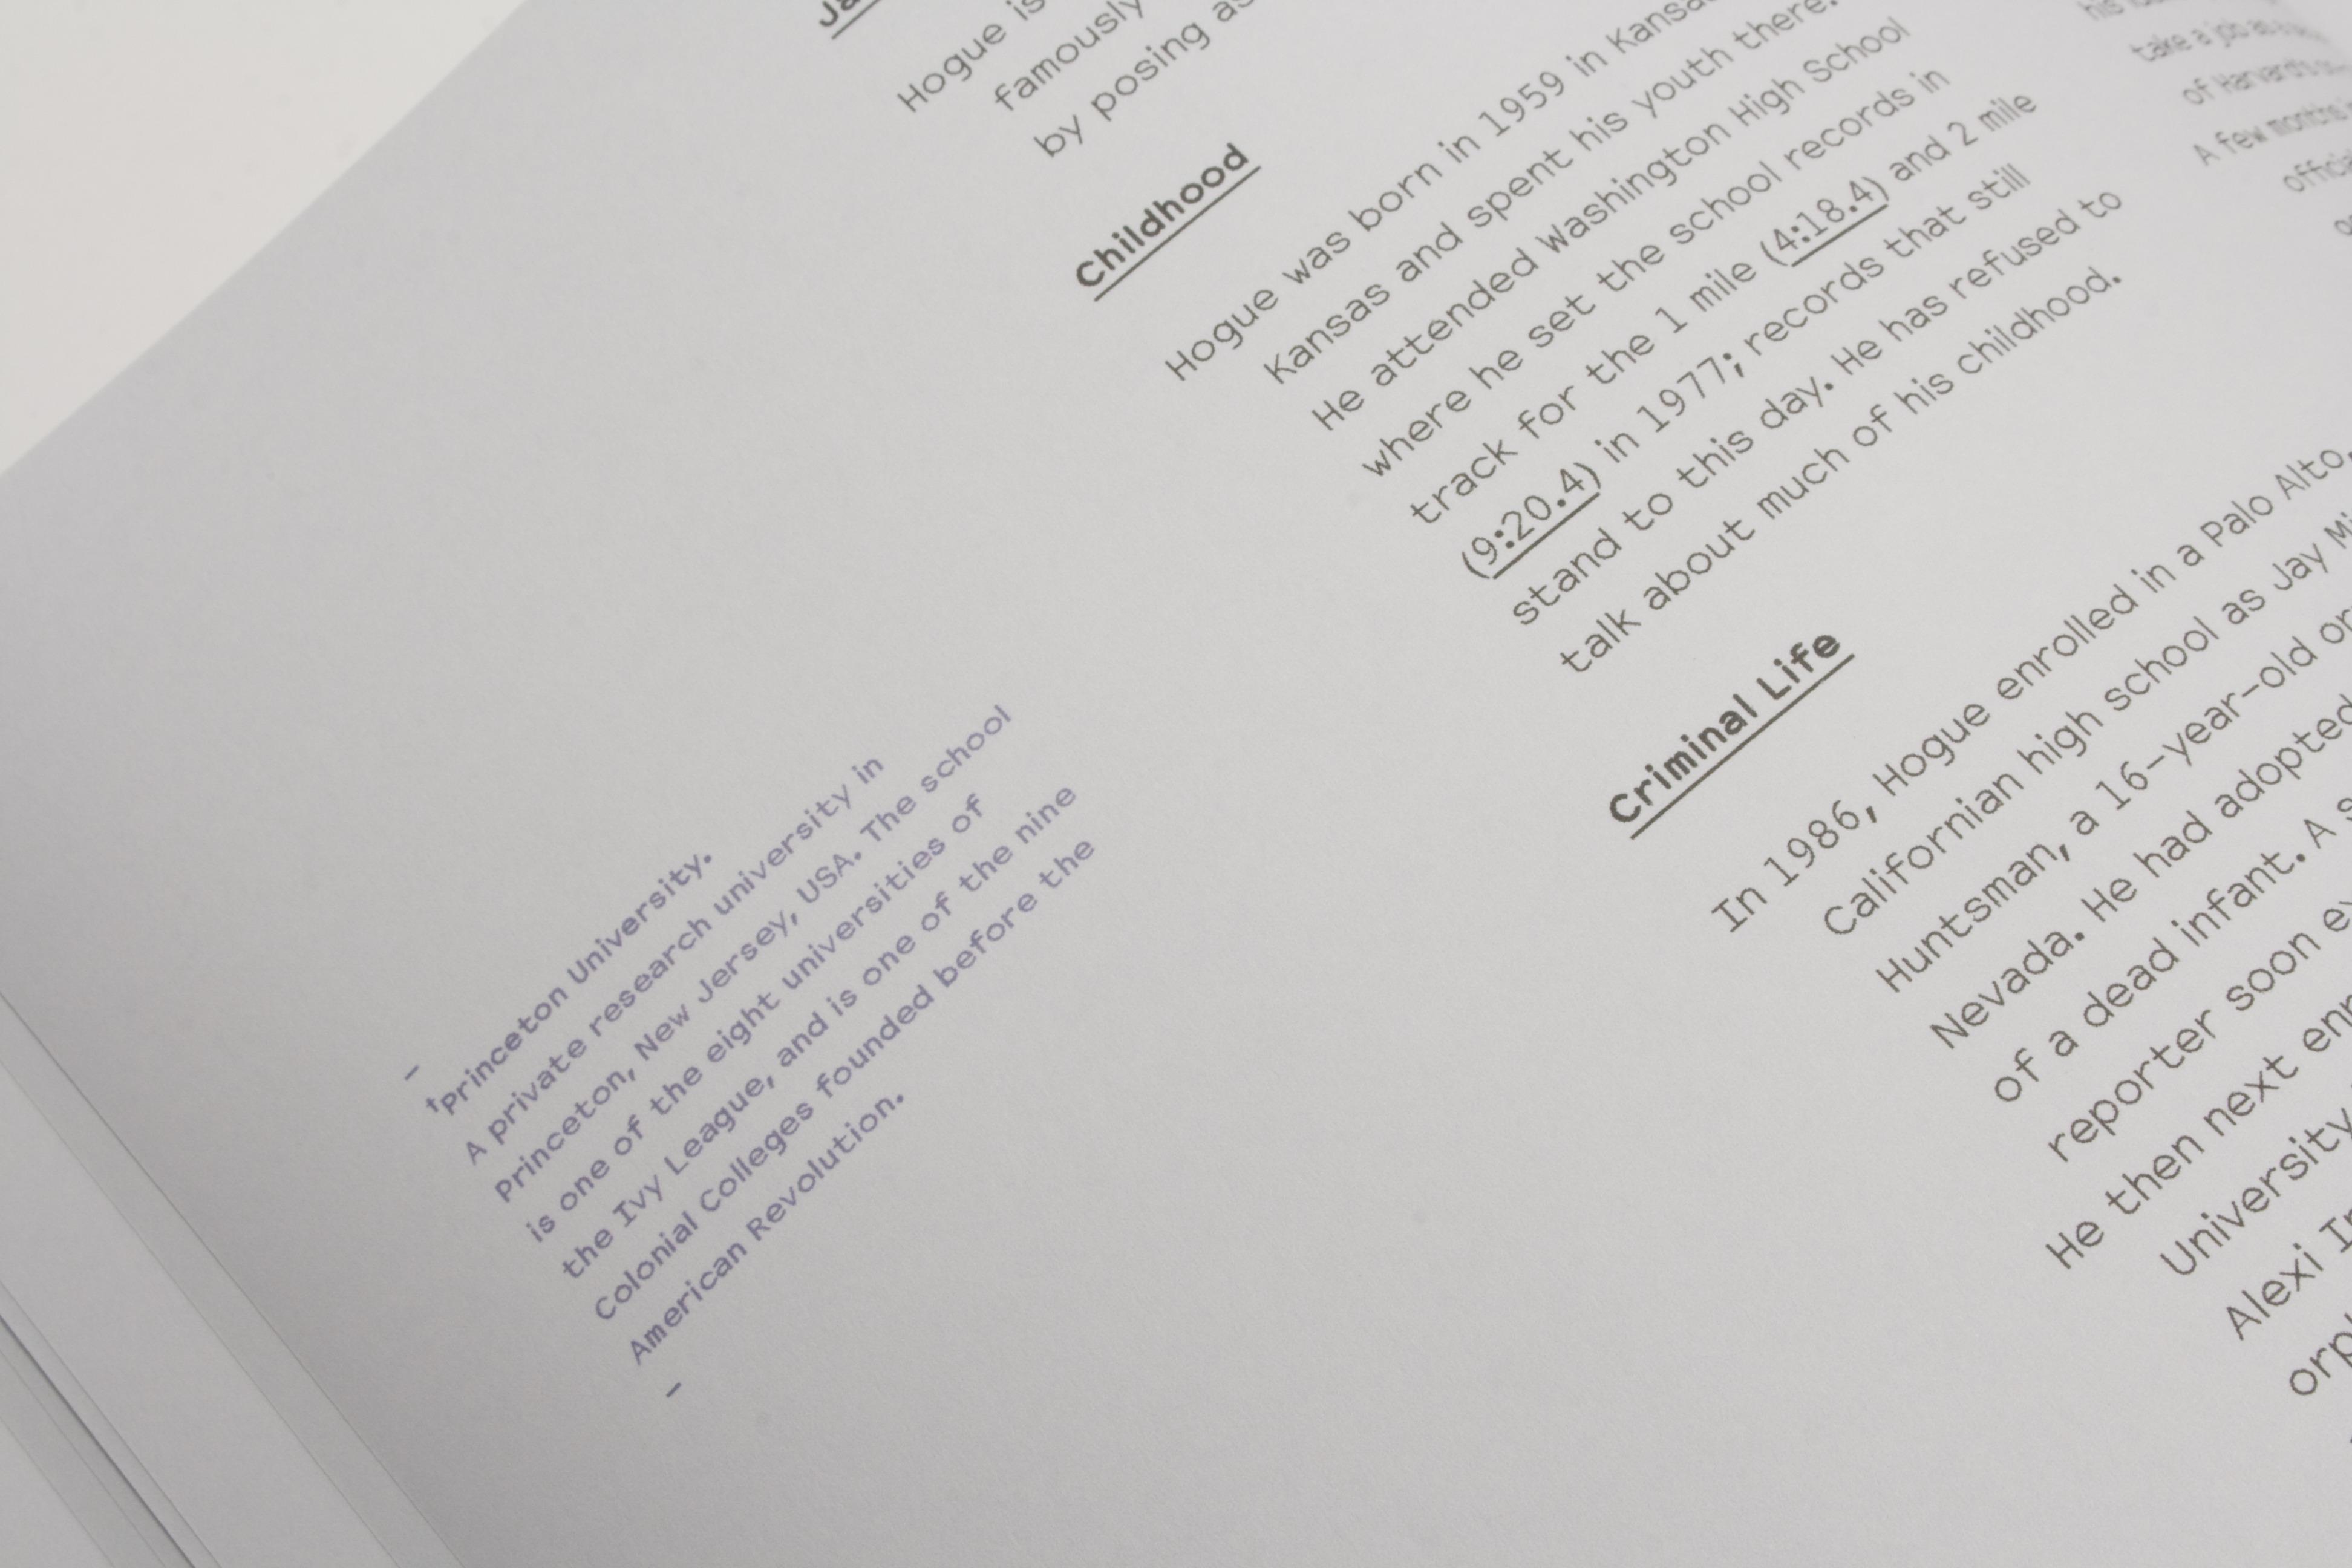 Callin Mackintosh is a Graphic Designer